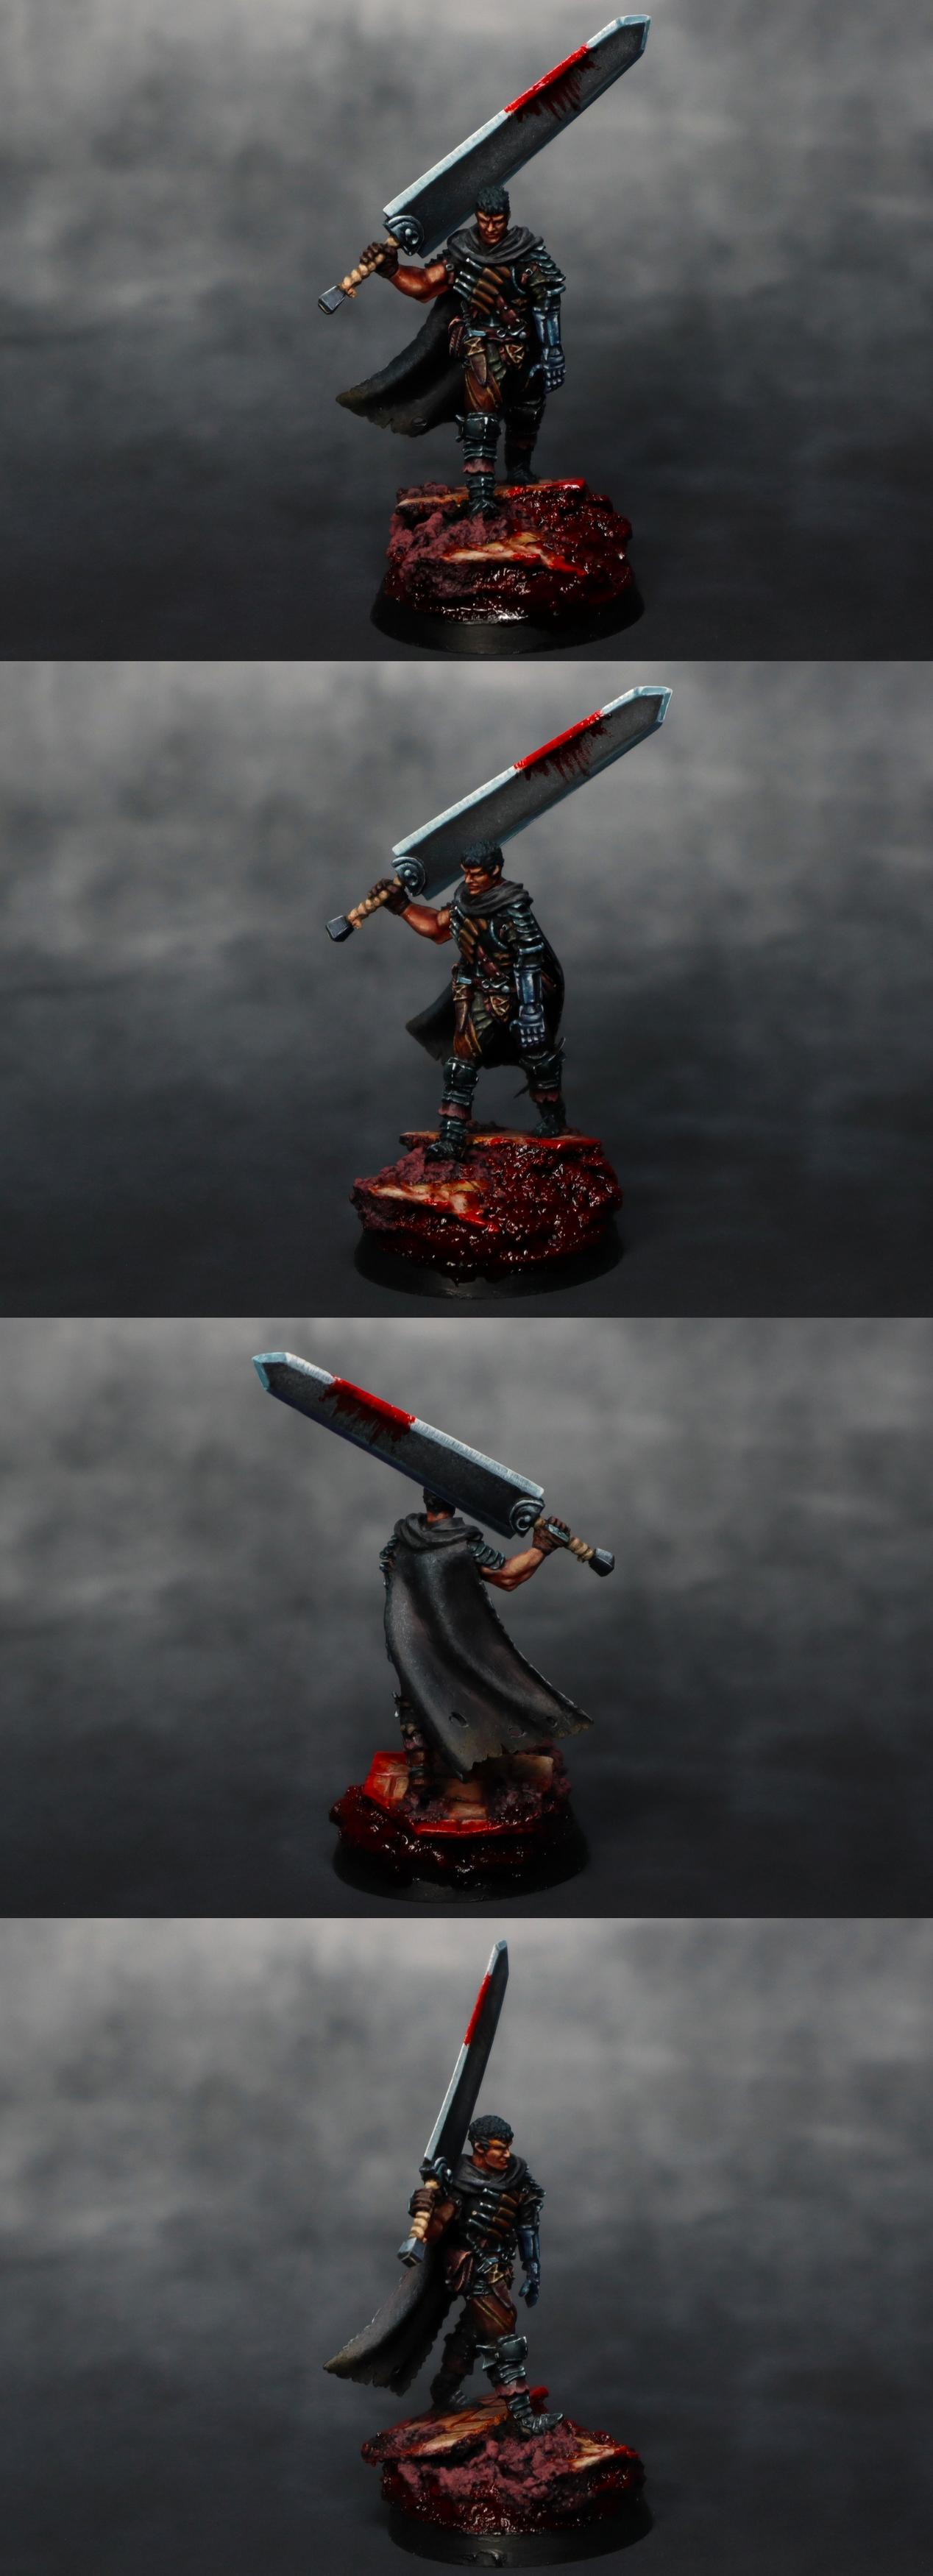 Guts / Gatsu the Black Swordsman